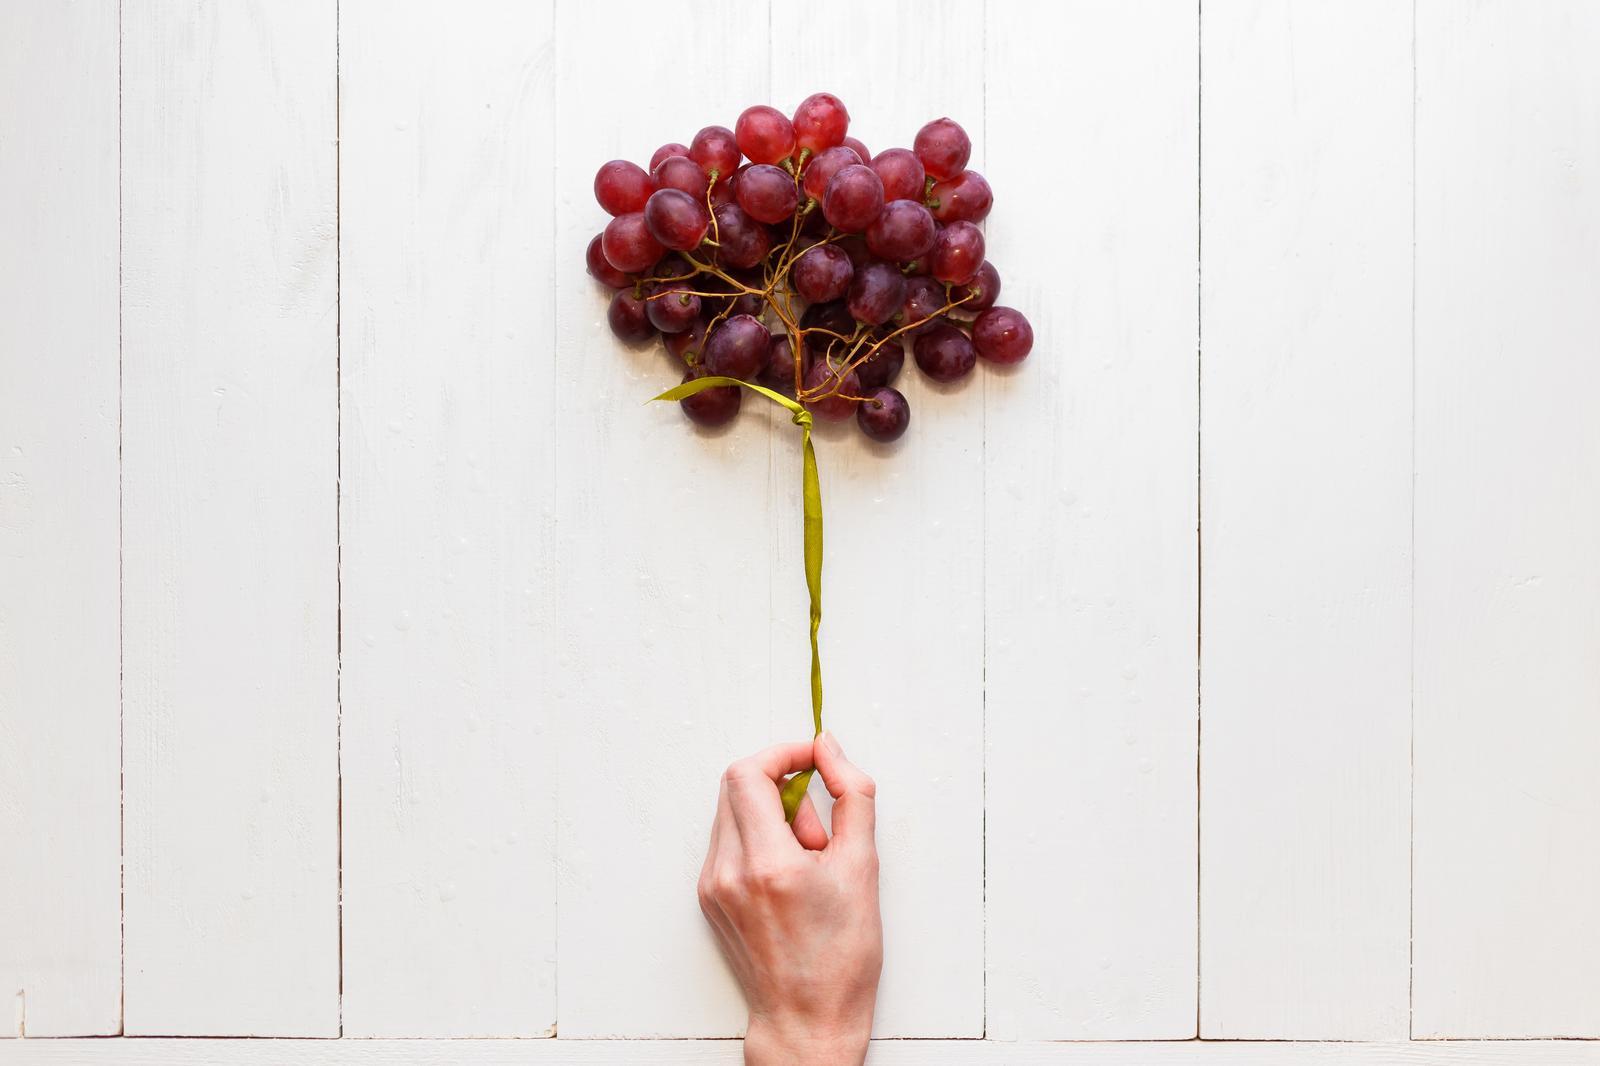 Viinamarjakasvatus Põlvamaal